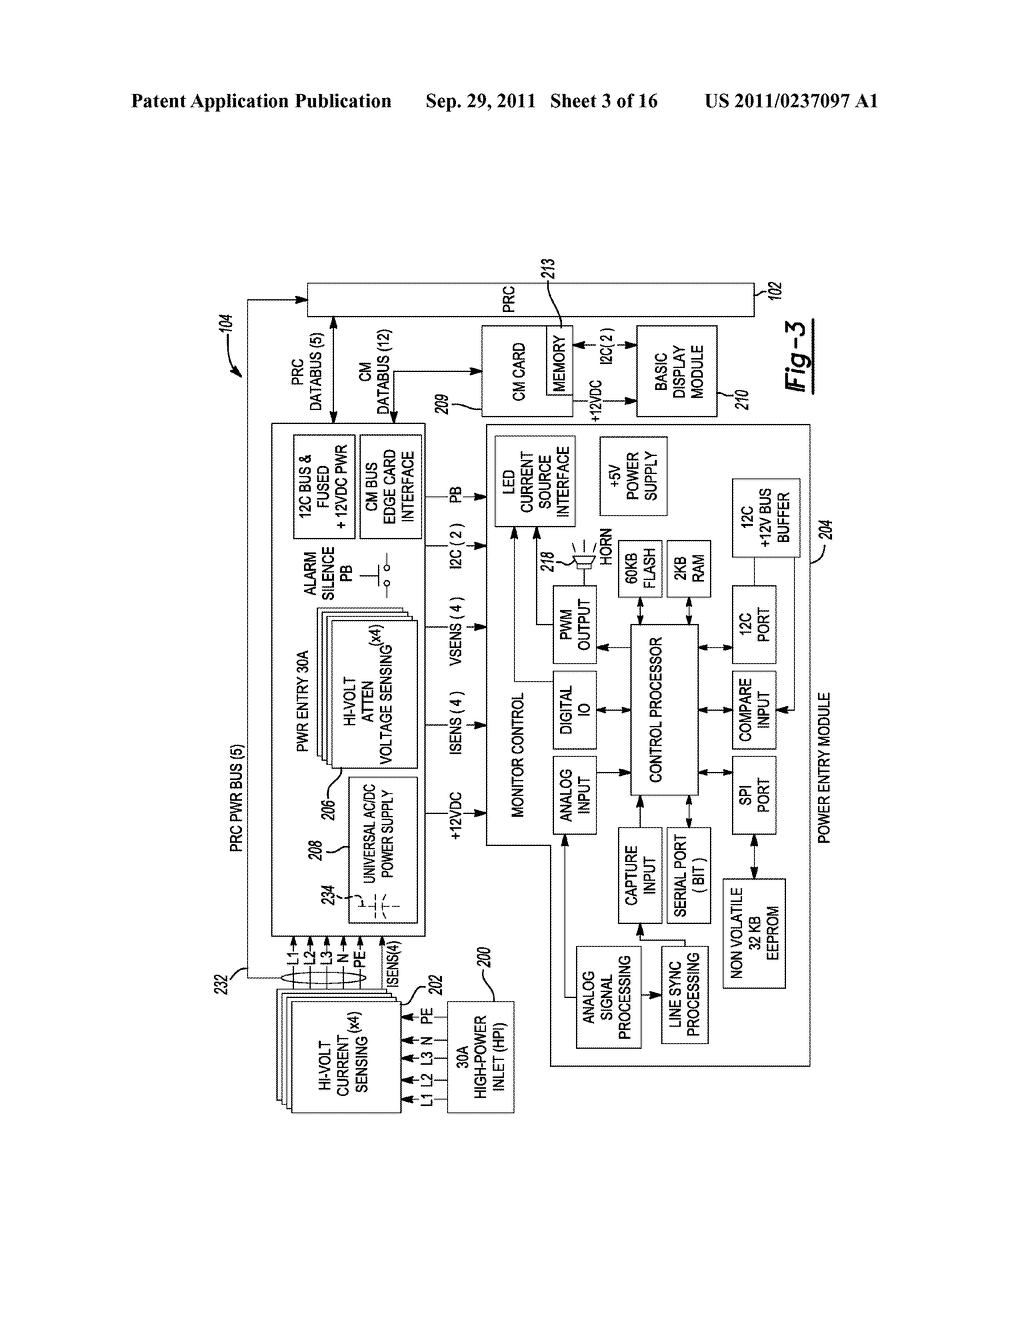 adaptive power strip diagram schematic and image 04 rh patentsencyclopedia com  power strip circuit